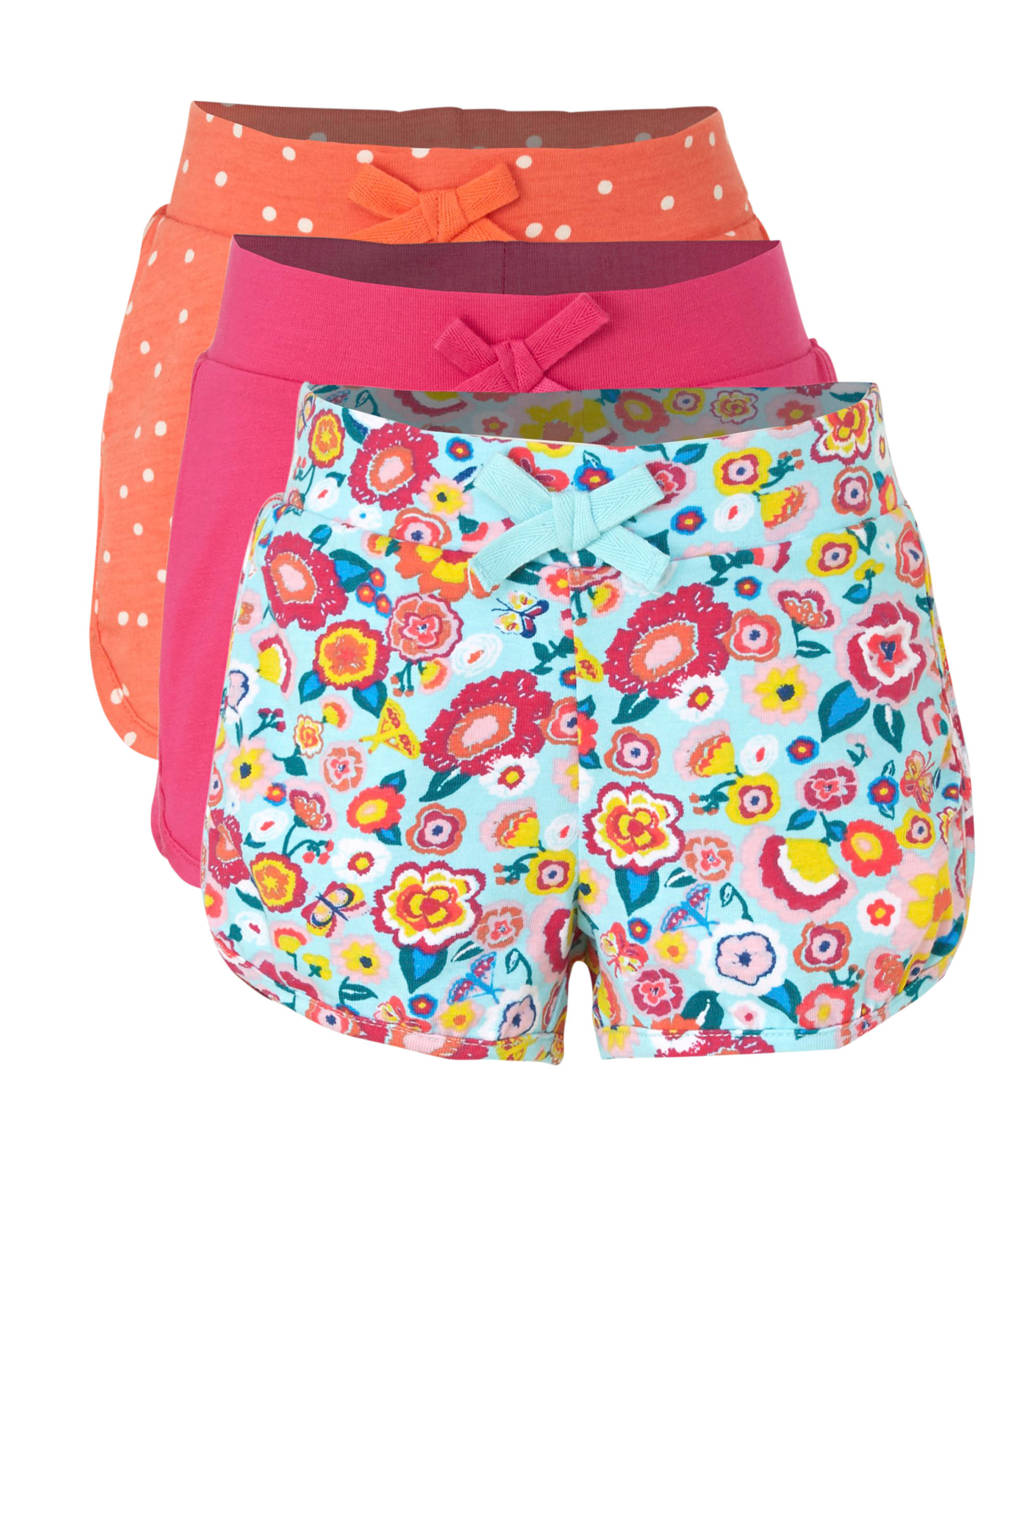 C&A Palomino sweatshort met all over print blauw/roze/oranje, Blauw/roze/oranje